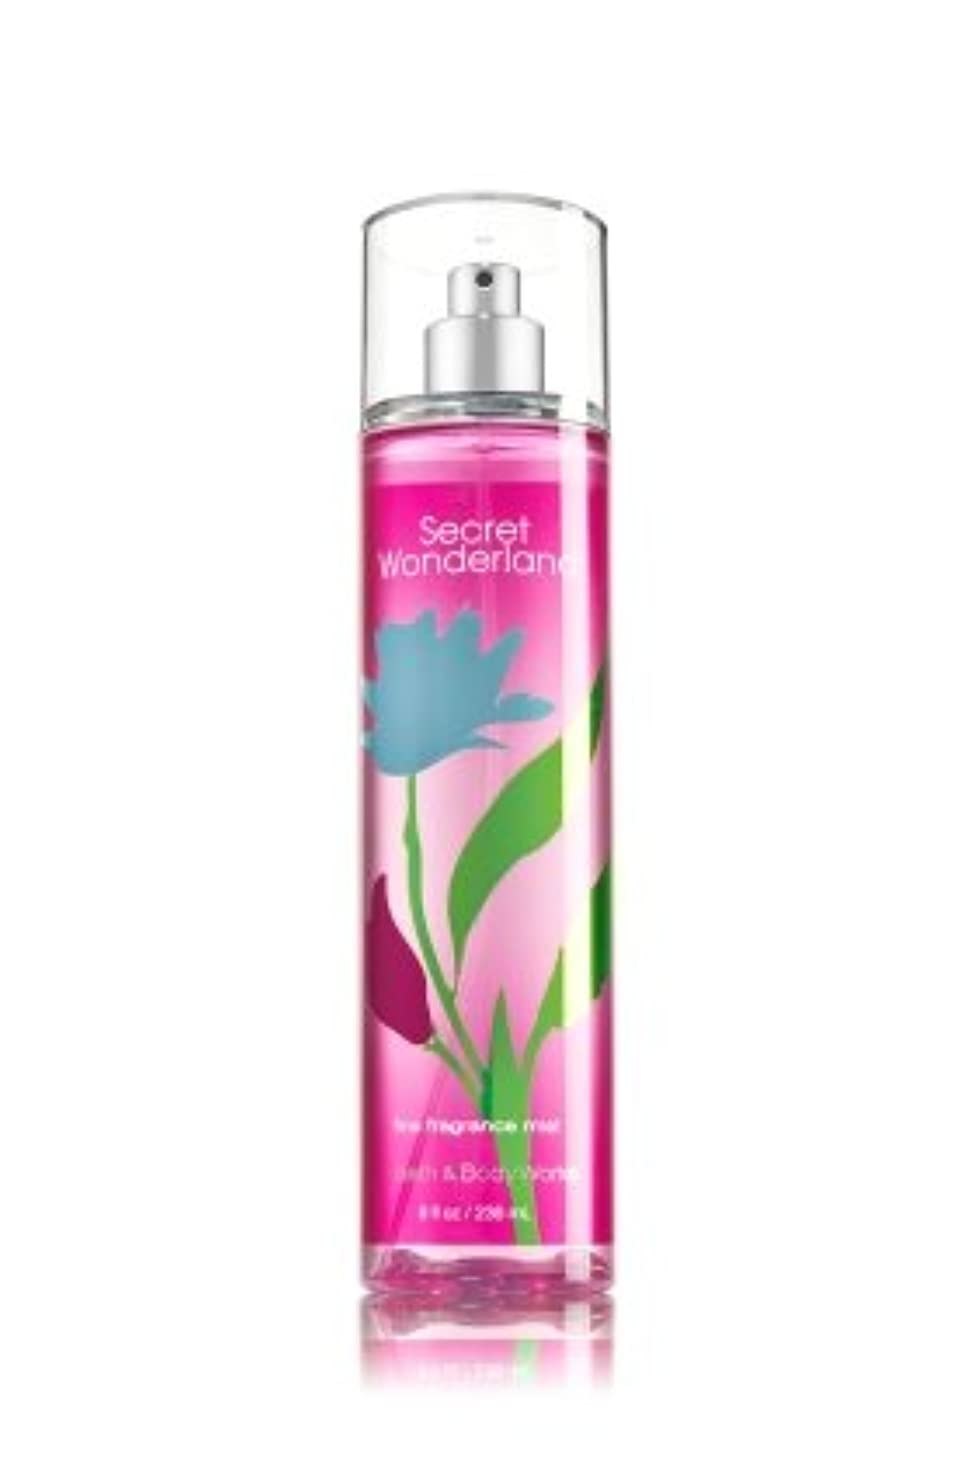 【Bath&Body Works/バス&ボディワークス】 ファインフレグランスミスト シークレットワンダーランド Fine Fragrance Mist Secret Wonderland 8oz (236ml) [並行輸入品]